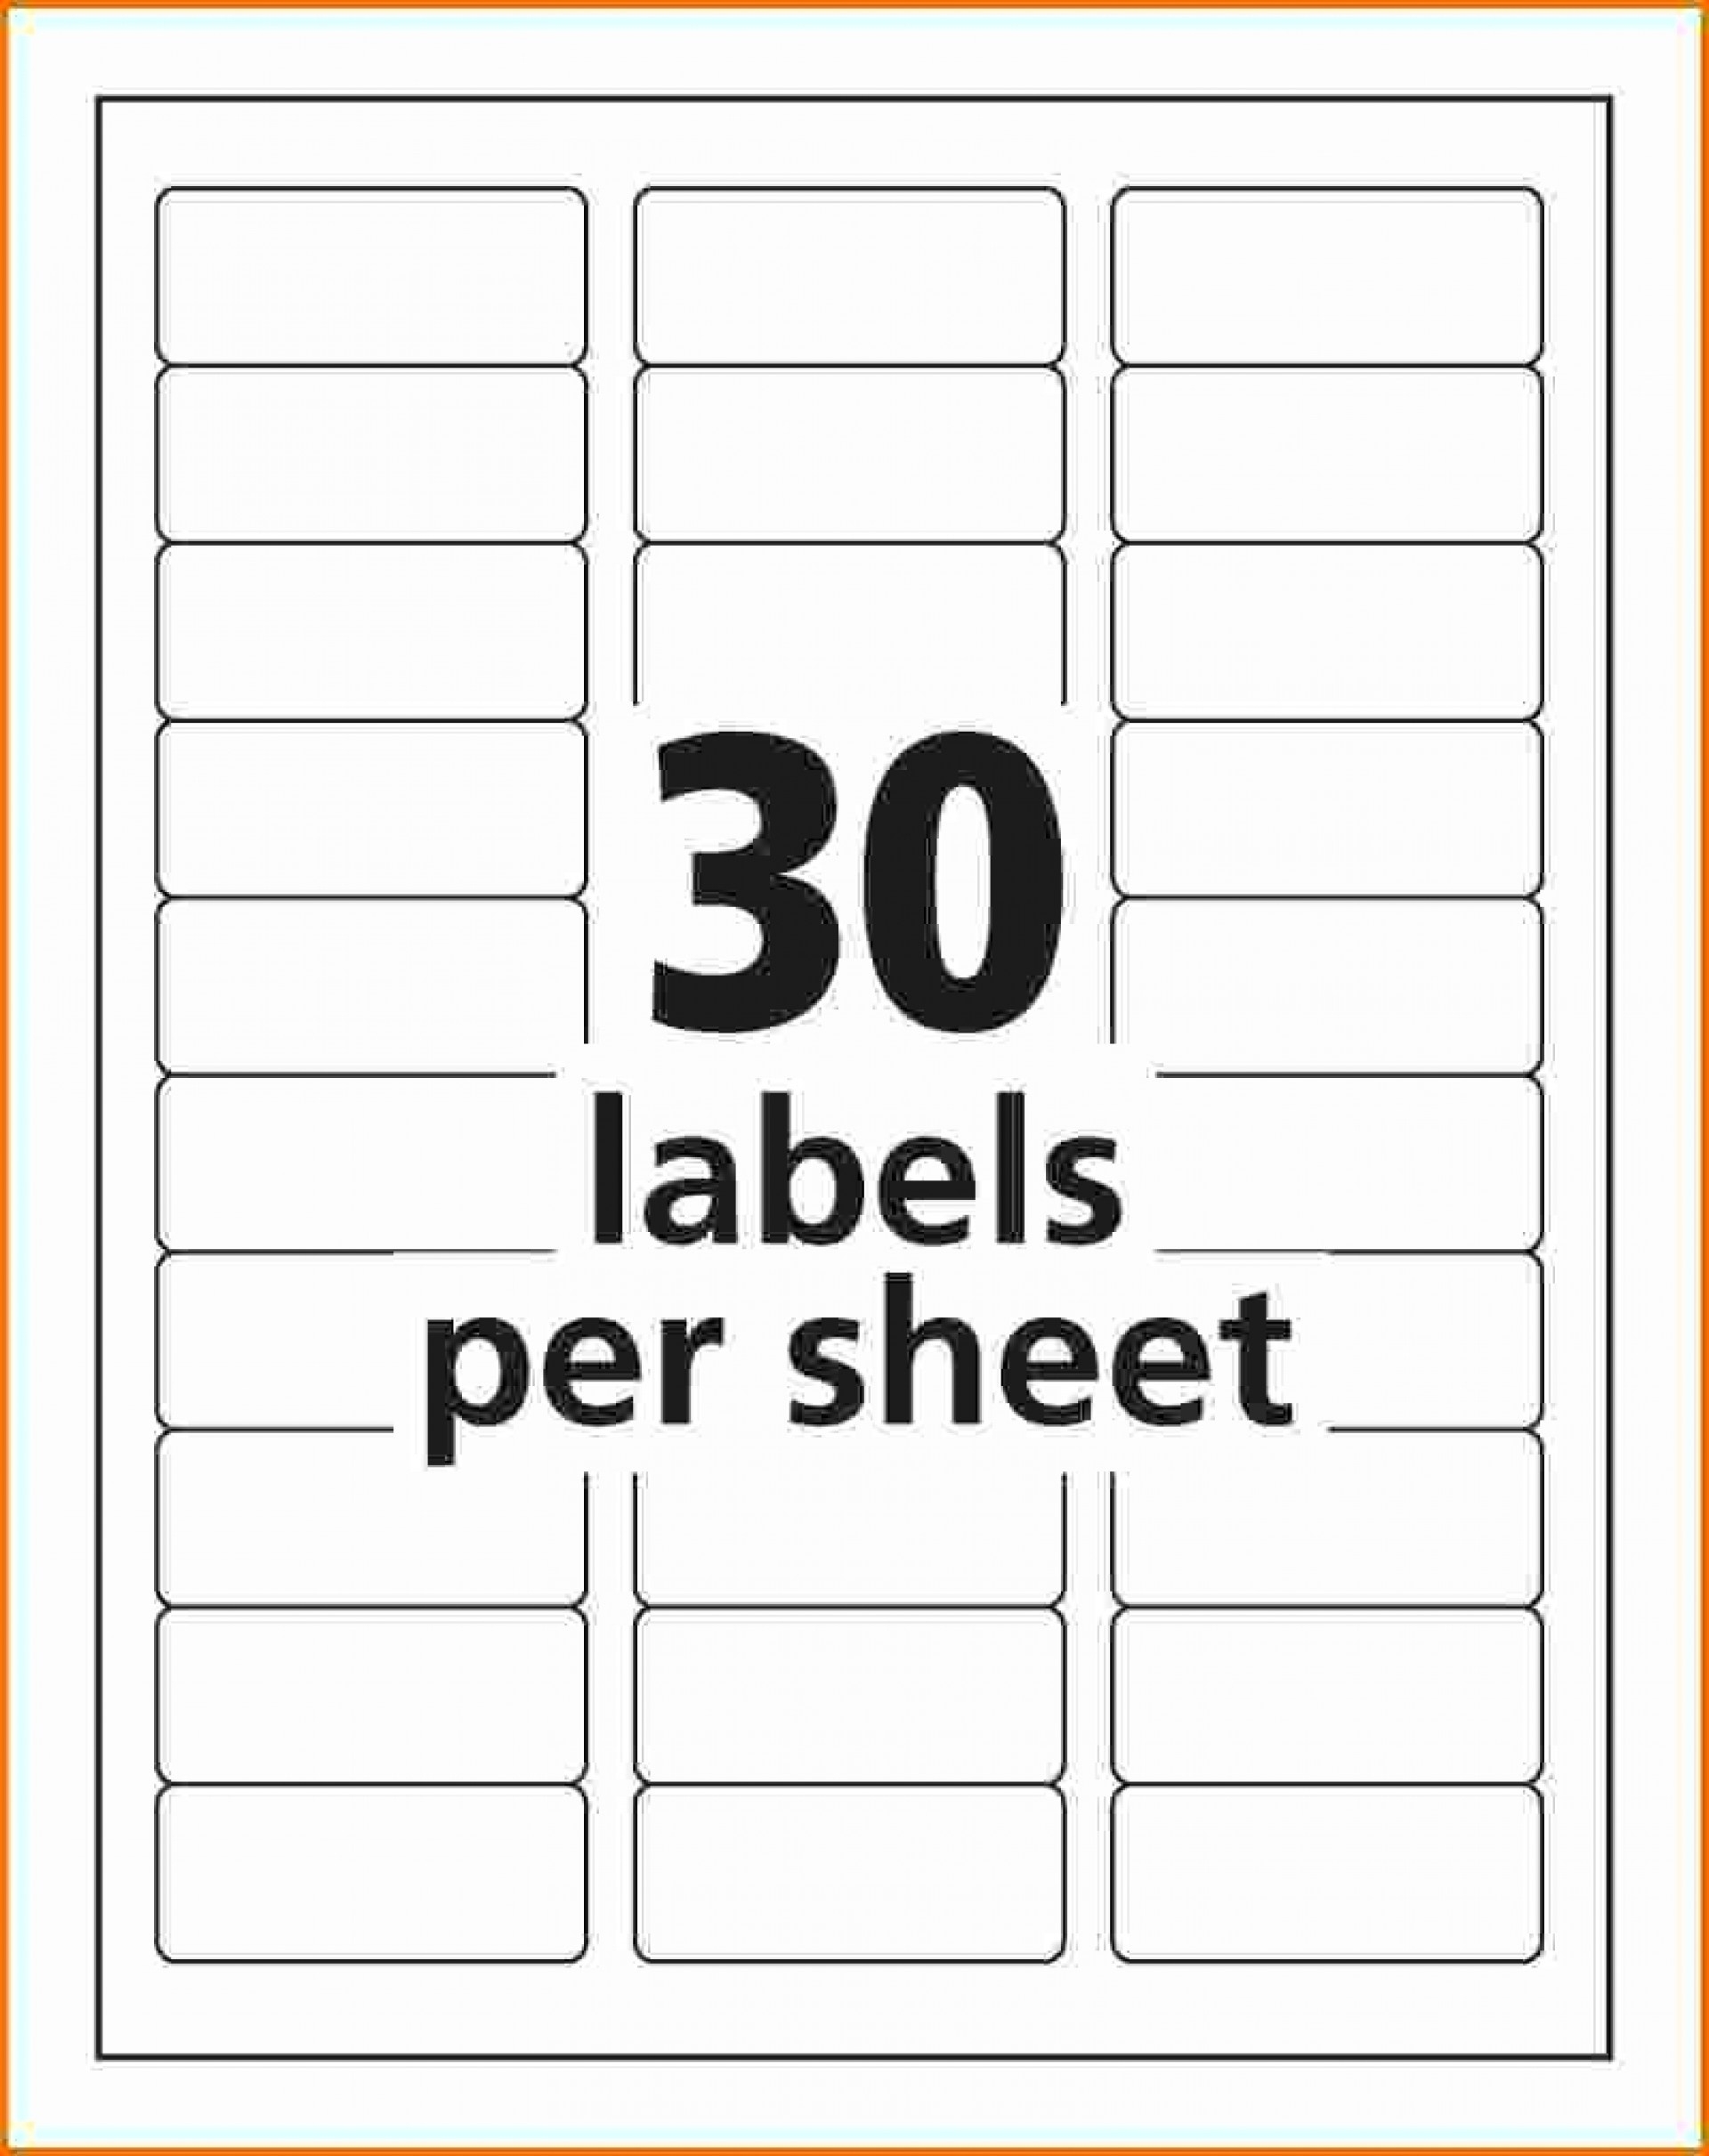 002 Template Ideas Free Printable Address Label Templates Imposing - Free Printable Address Label Templates